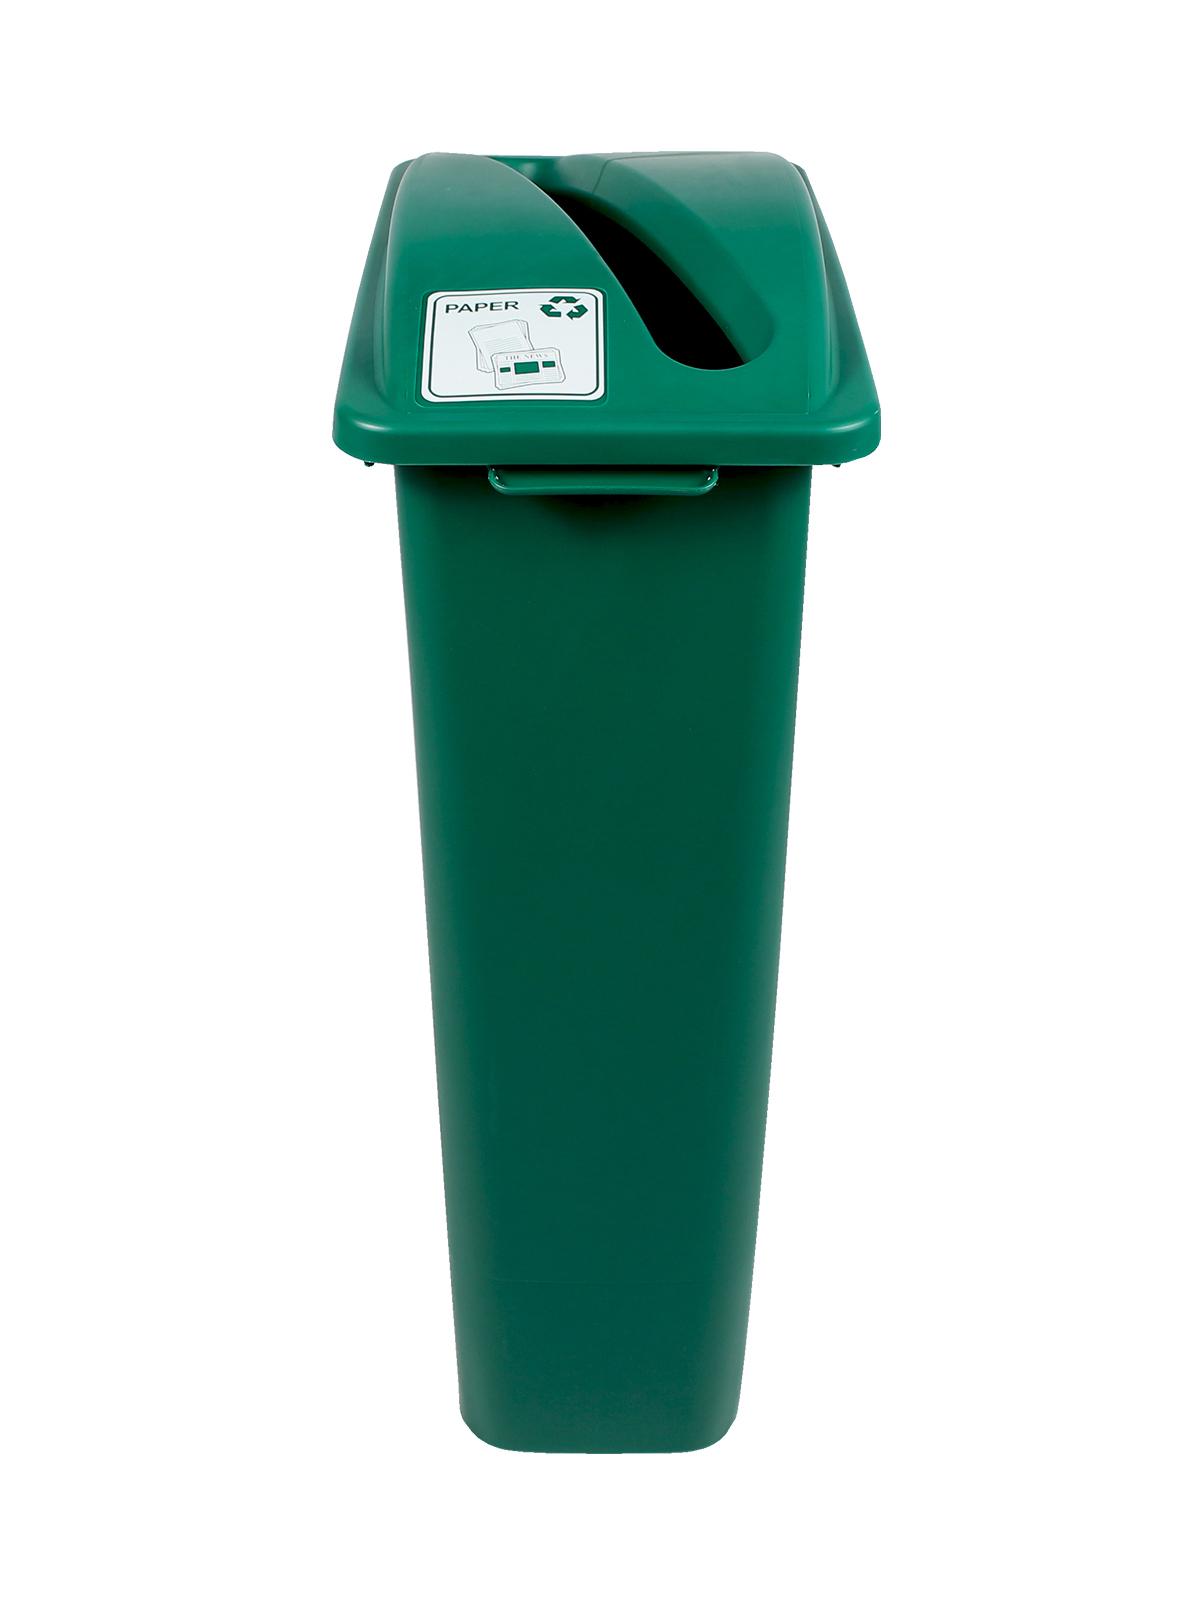 WASTE WATCHER - Single - Paper - Slot - Green